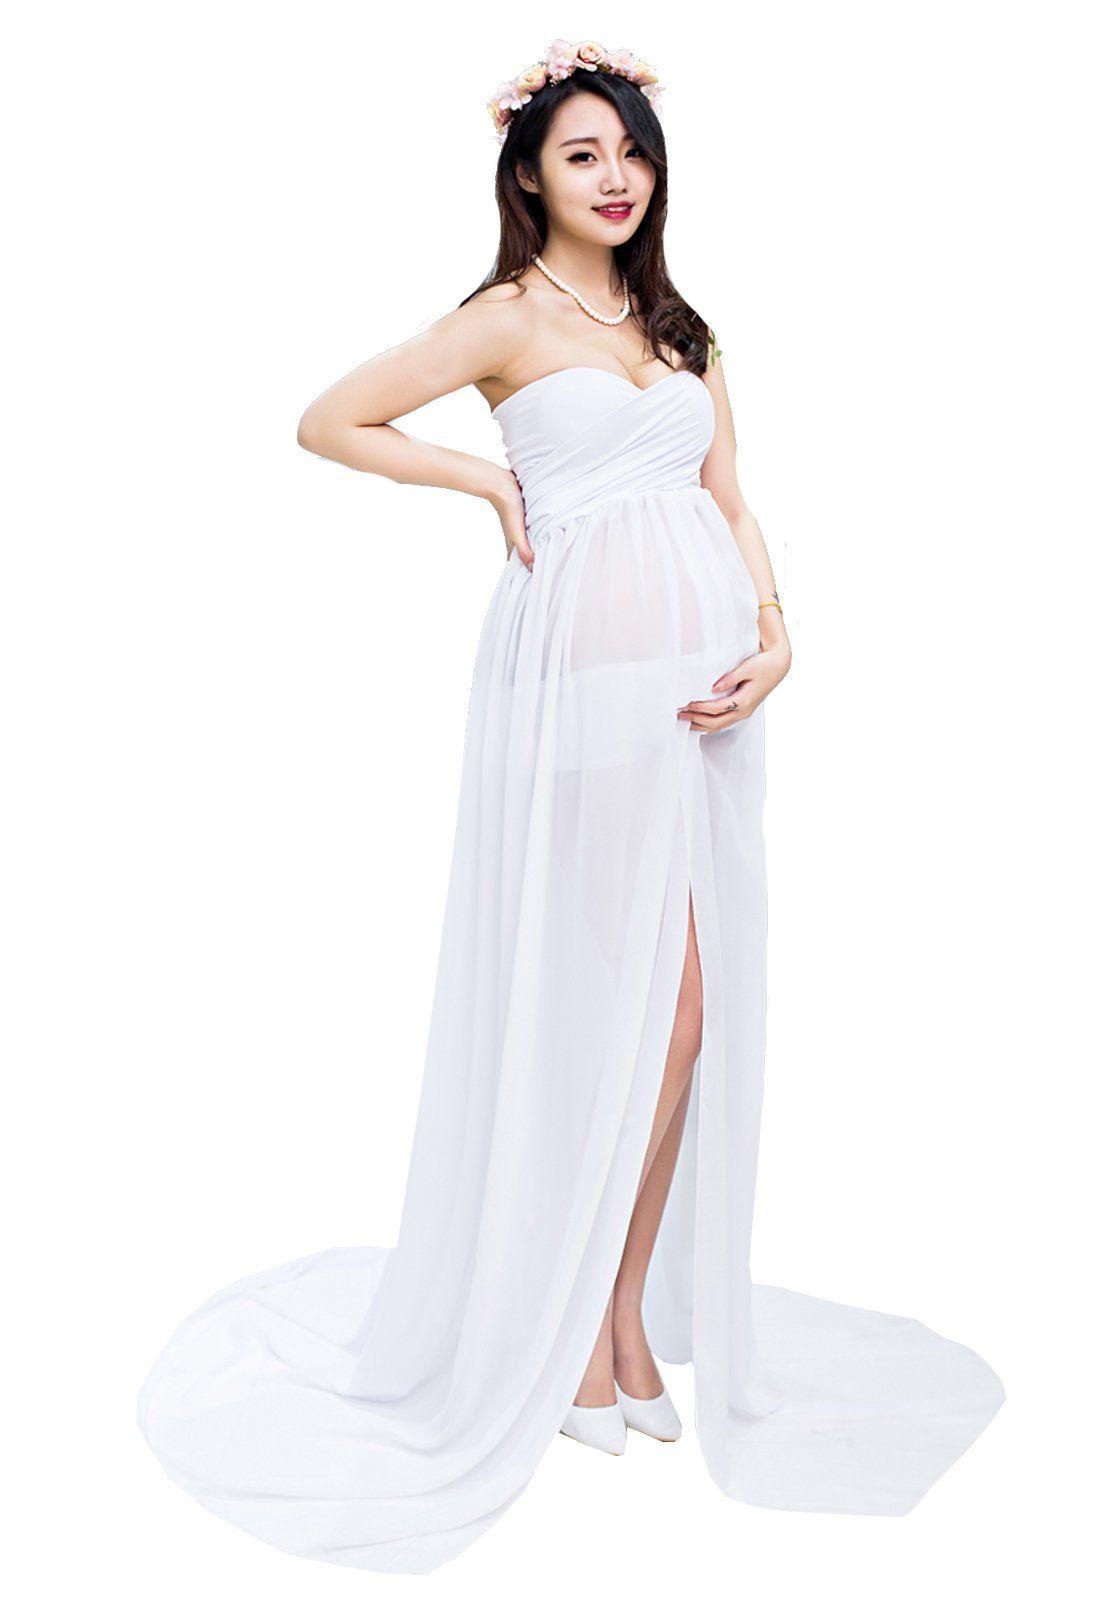 2e7be83fc893 White Maternity Maxi Dress Amazon - Barrier Surveillance